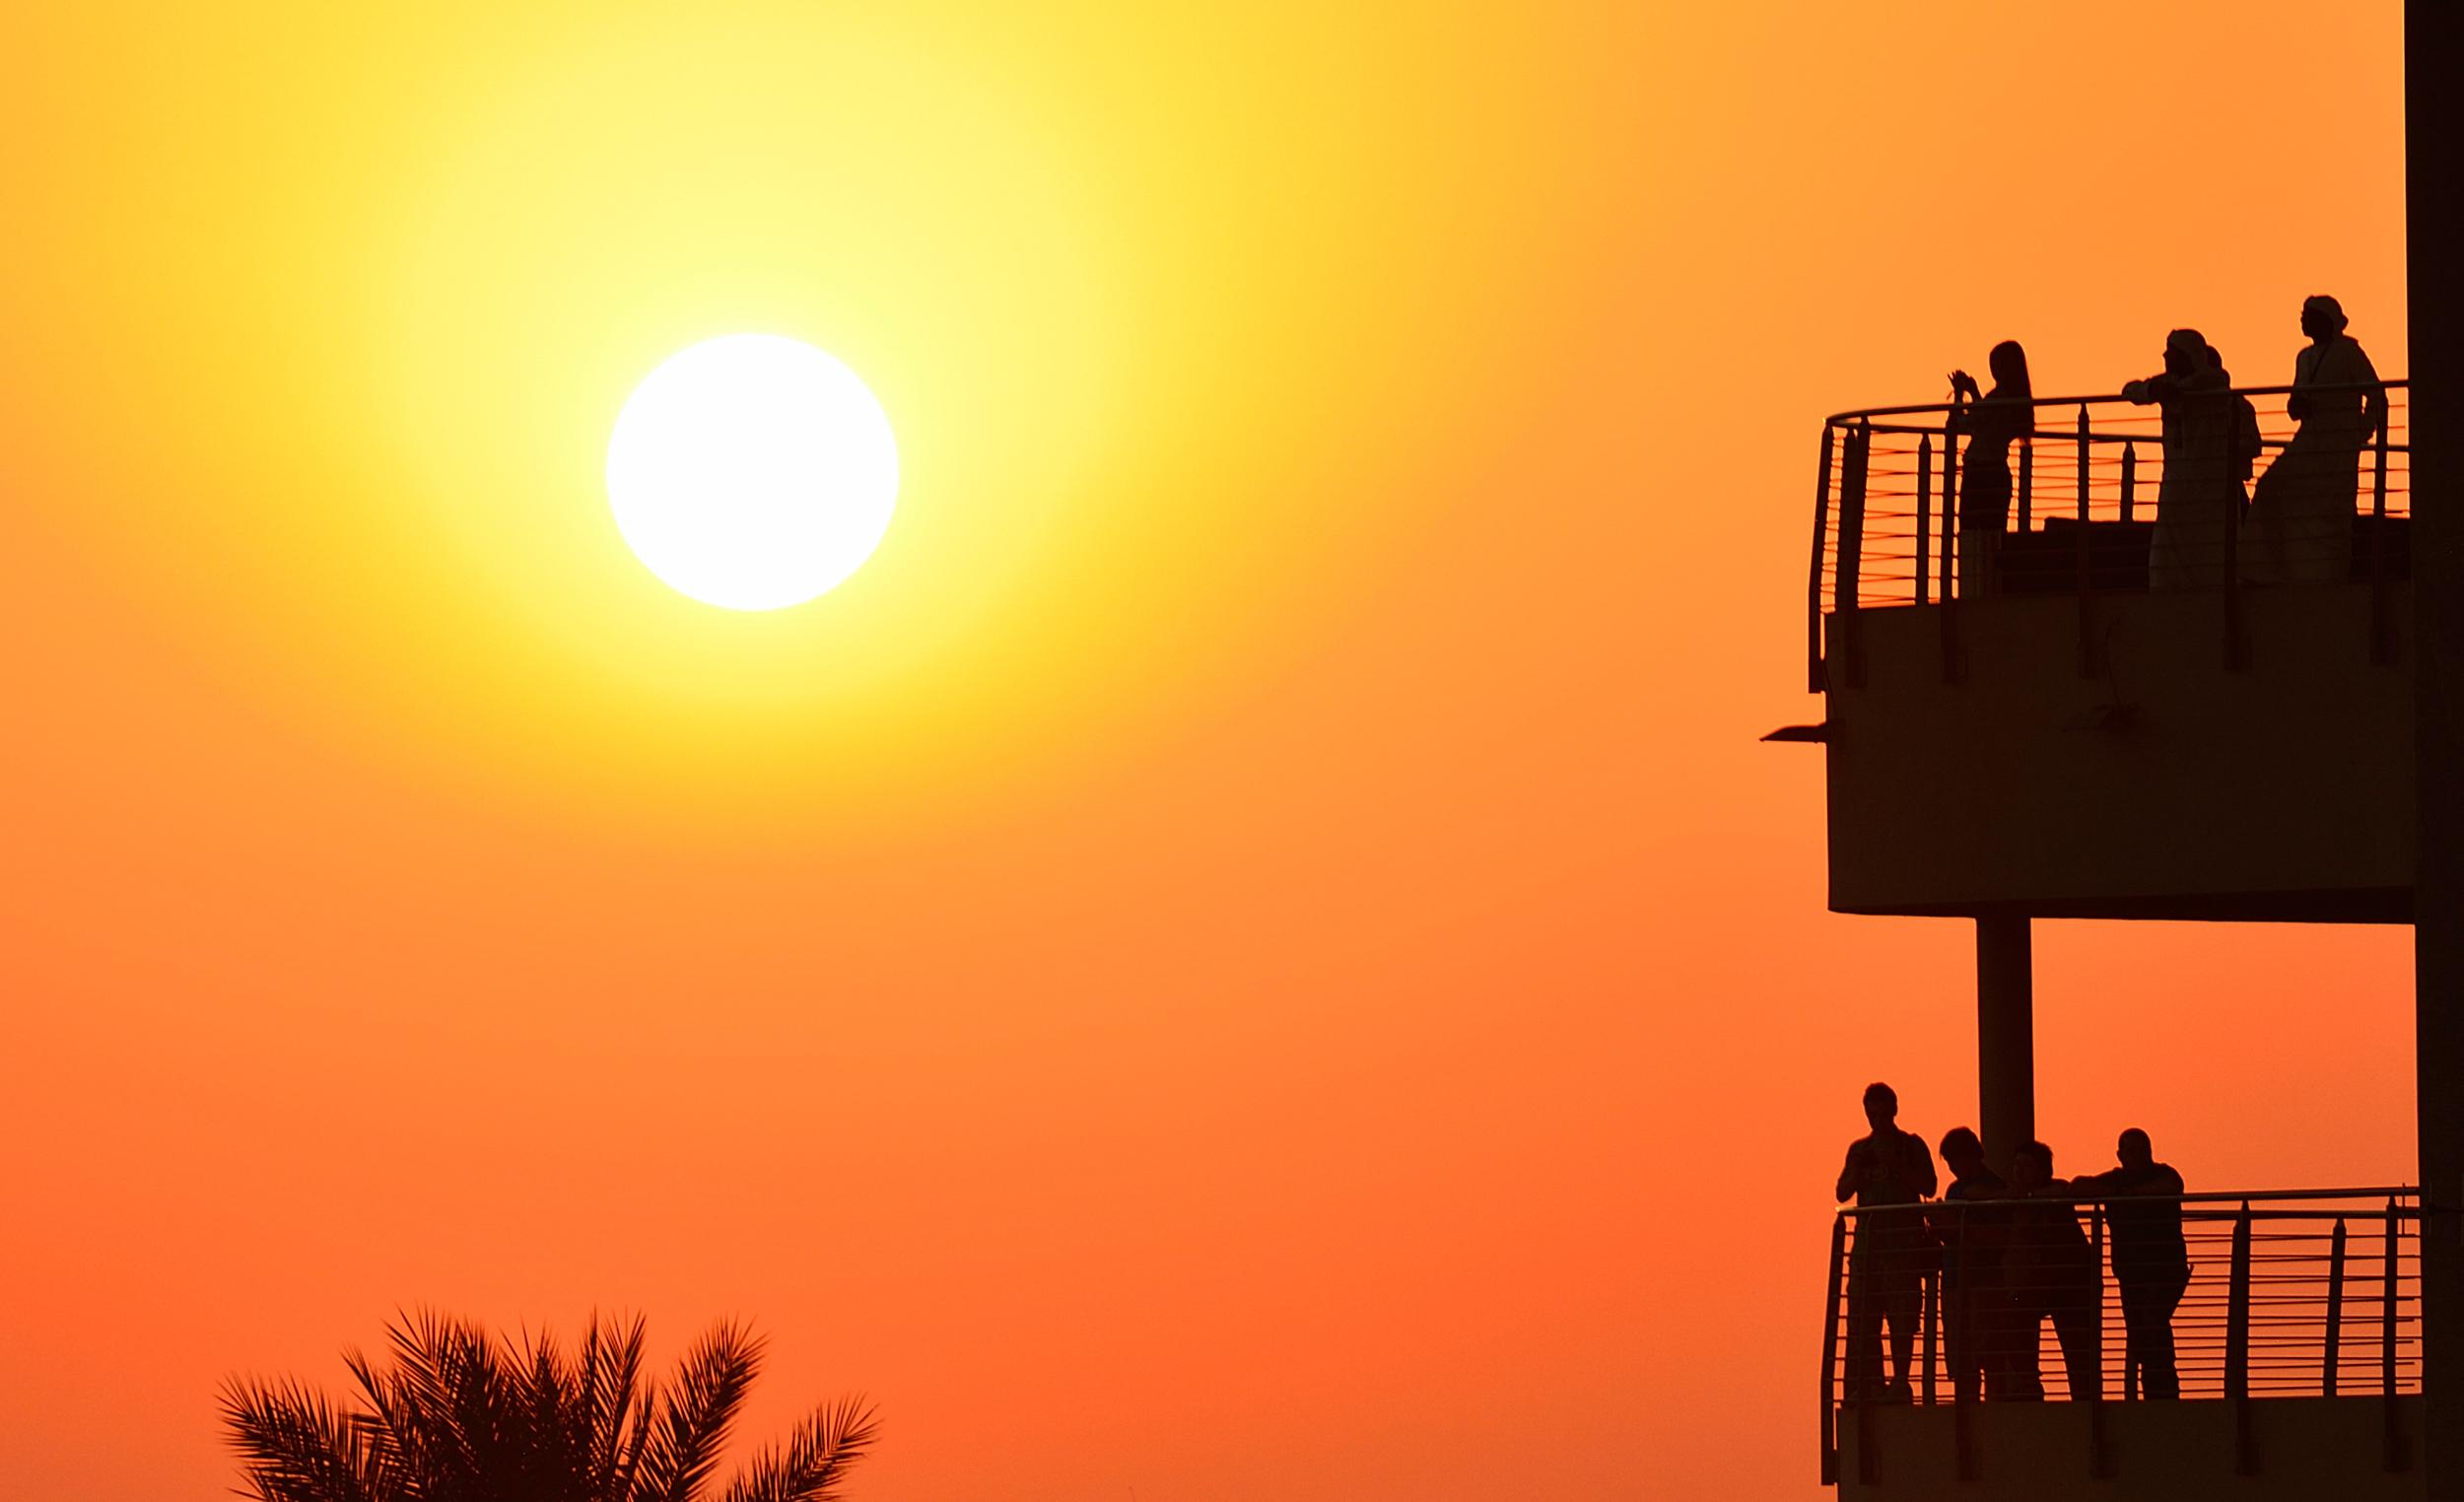 View from The North Grandstand at F1 Etihad Airways Abu Dhabi Grand Prix 2012 at Yas Marina.